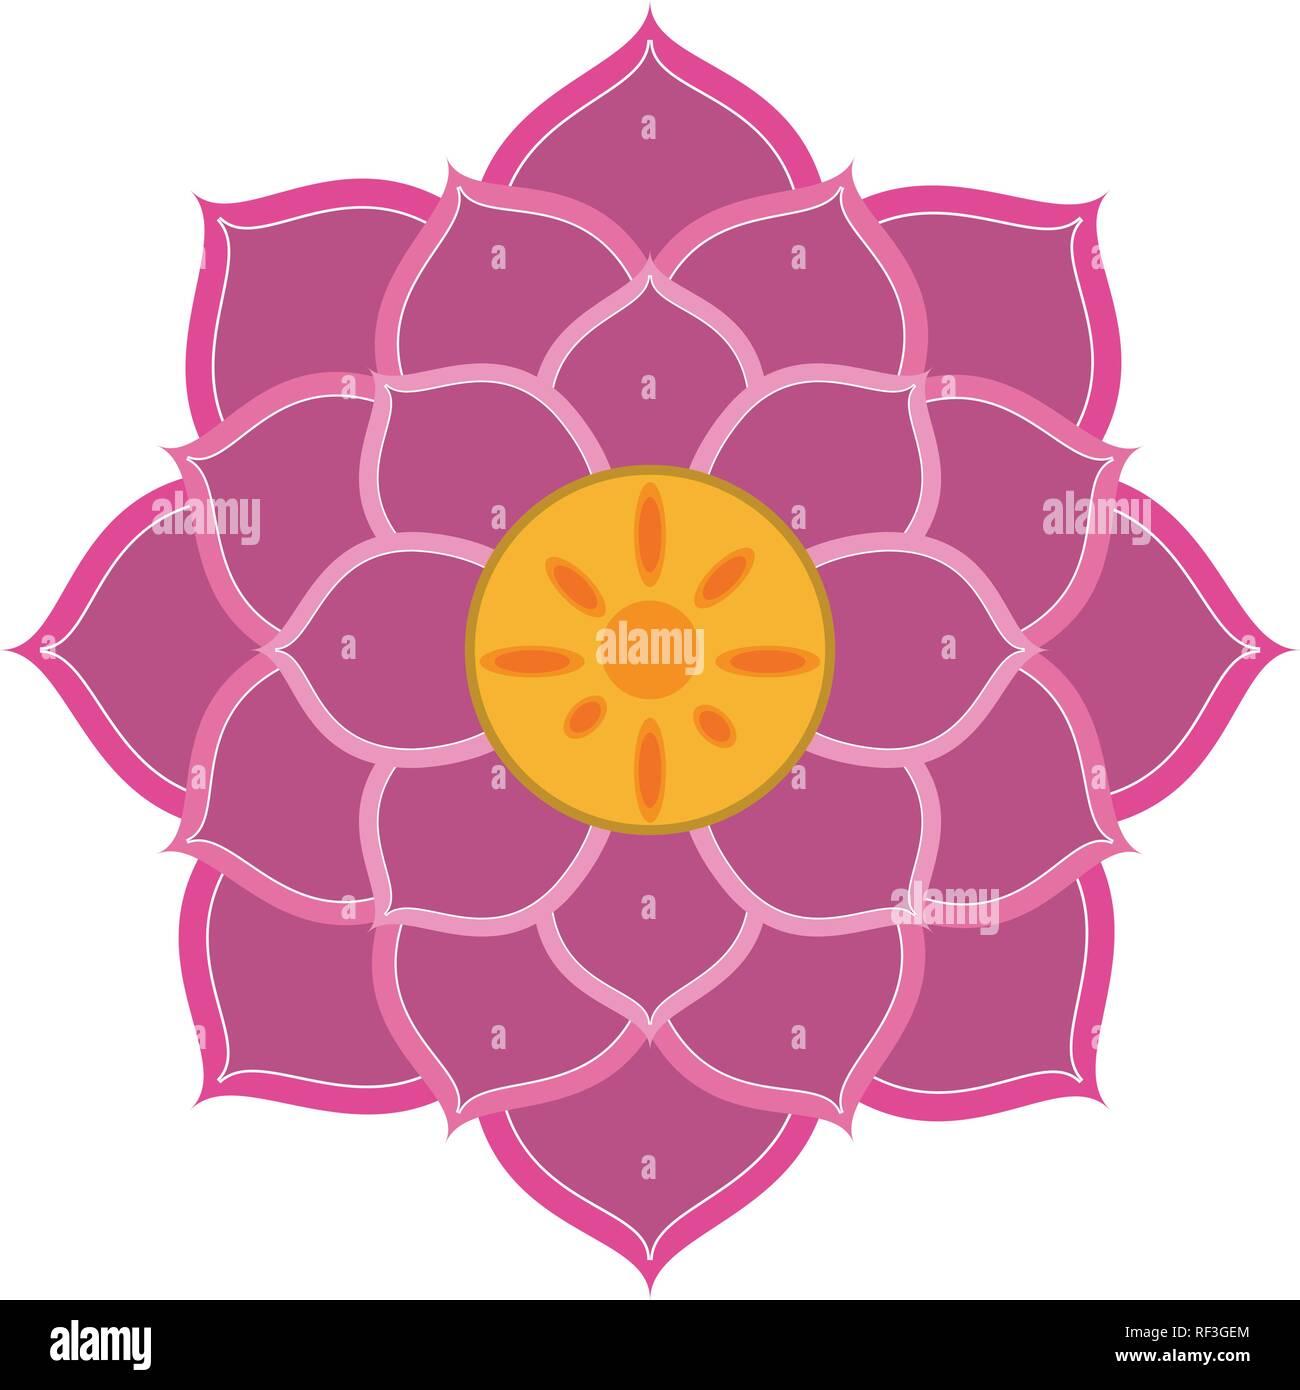 Lotus Flower Design Stock Photos Lotus Flower Design Stock Images